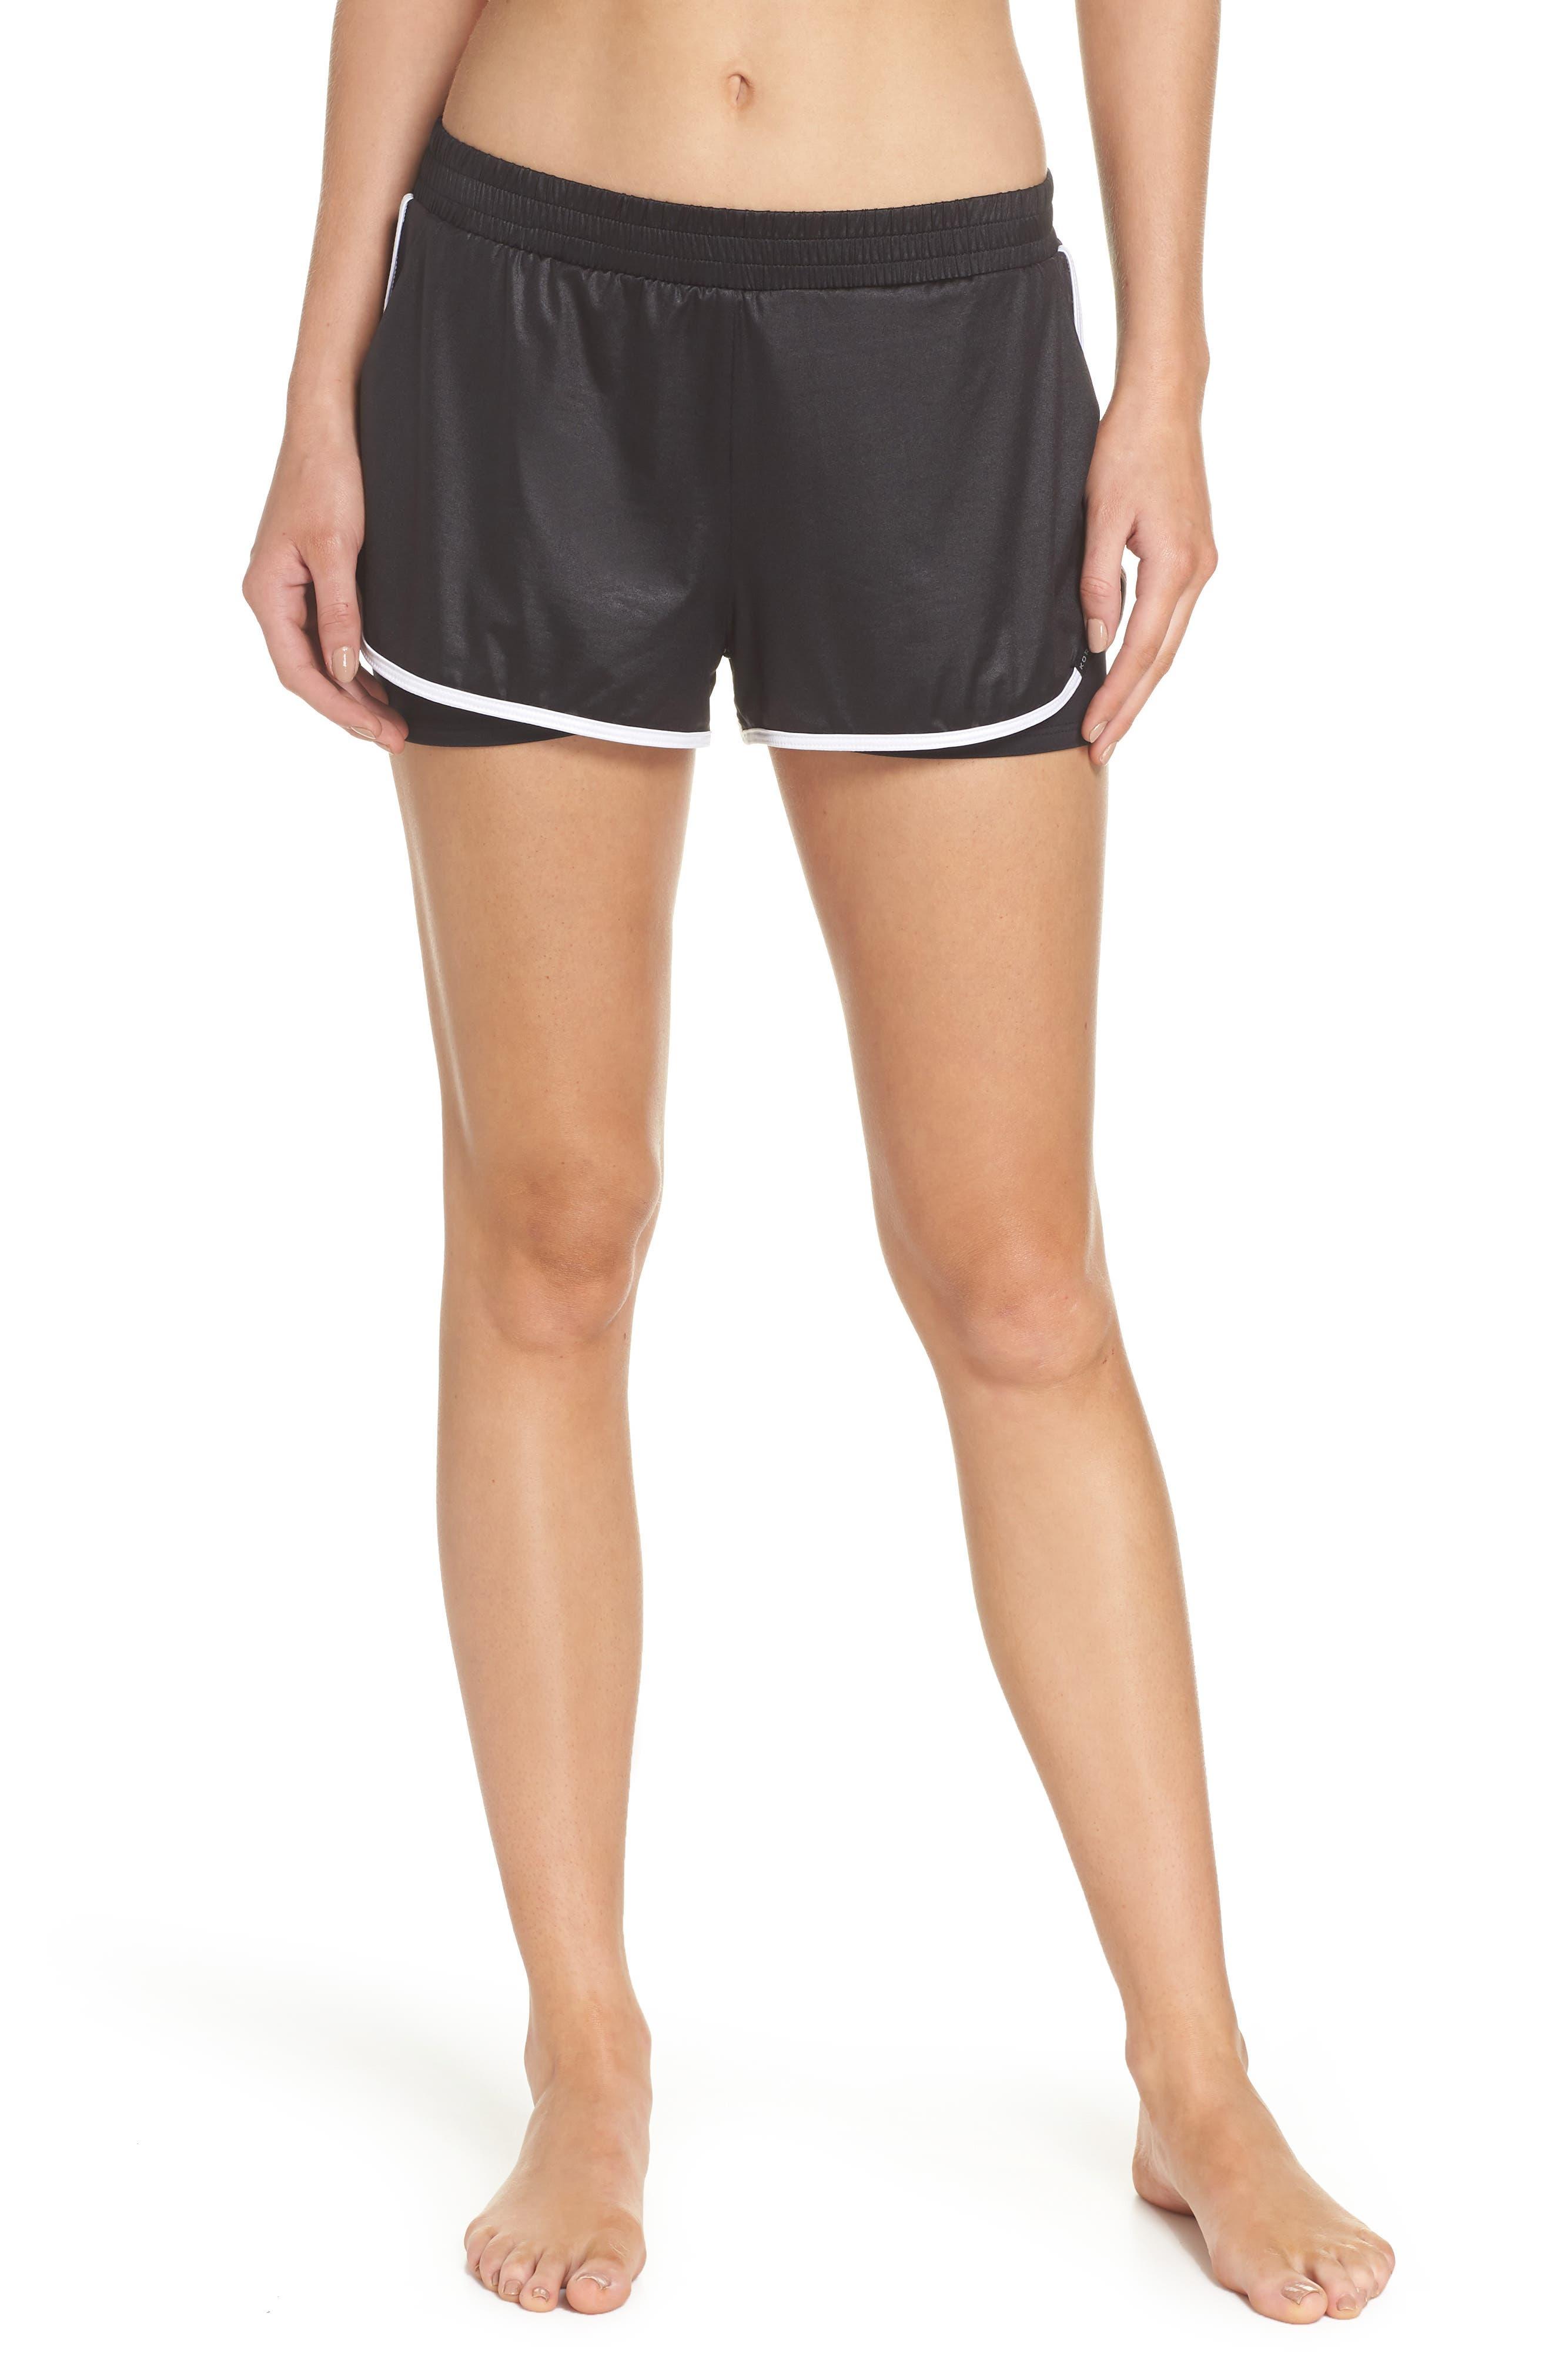 Scout Gym Shorts,                             Main thumbnail 1, color,                             BLACK/ WHITE